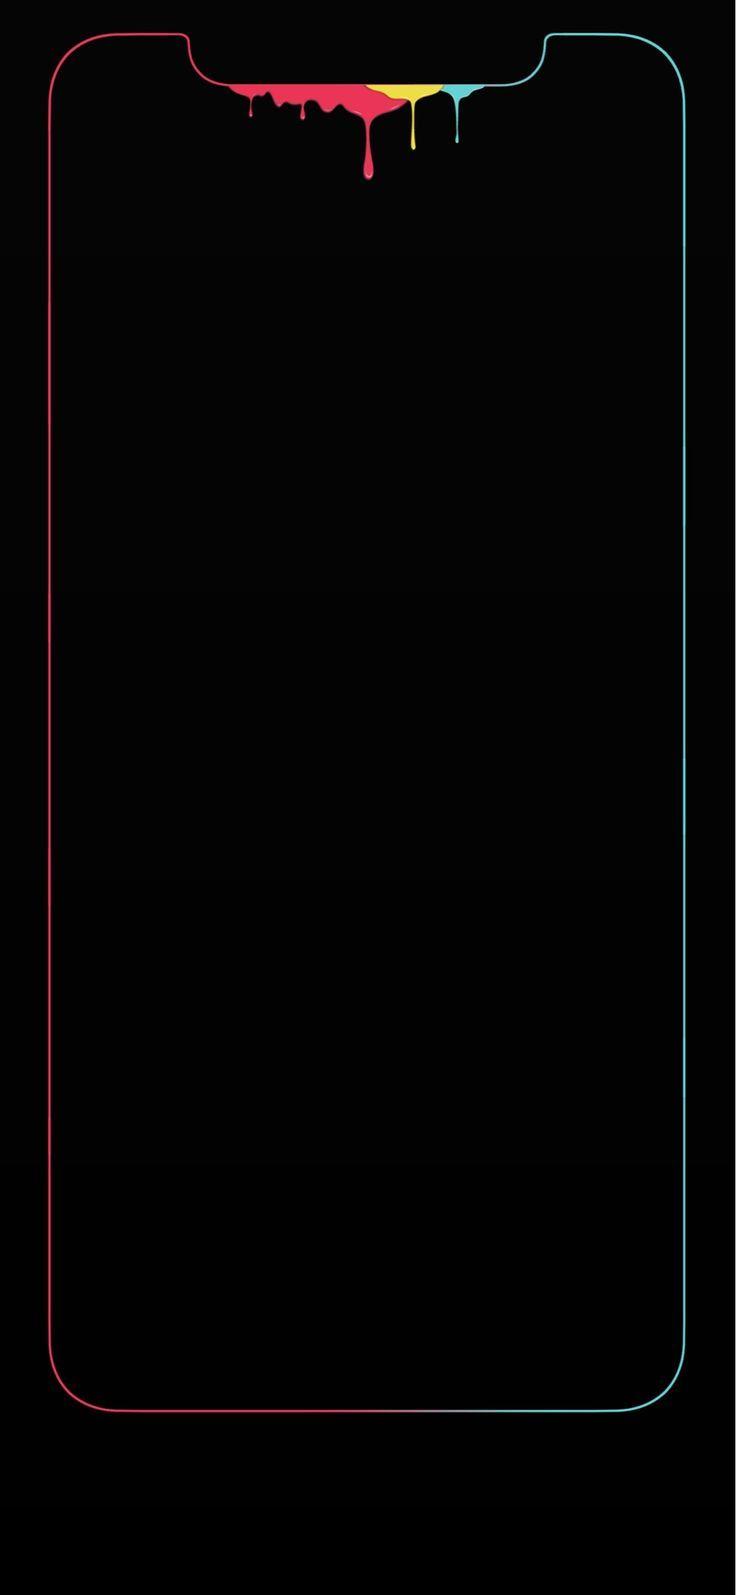 iPhone Hintergrundbild Das iPhone X / Xs Wallpaper-Thema - Seite 53 - iPhone, iPad, iPod-Fore... #iphonelockscreen